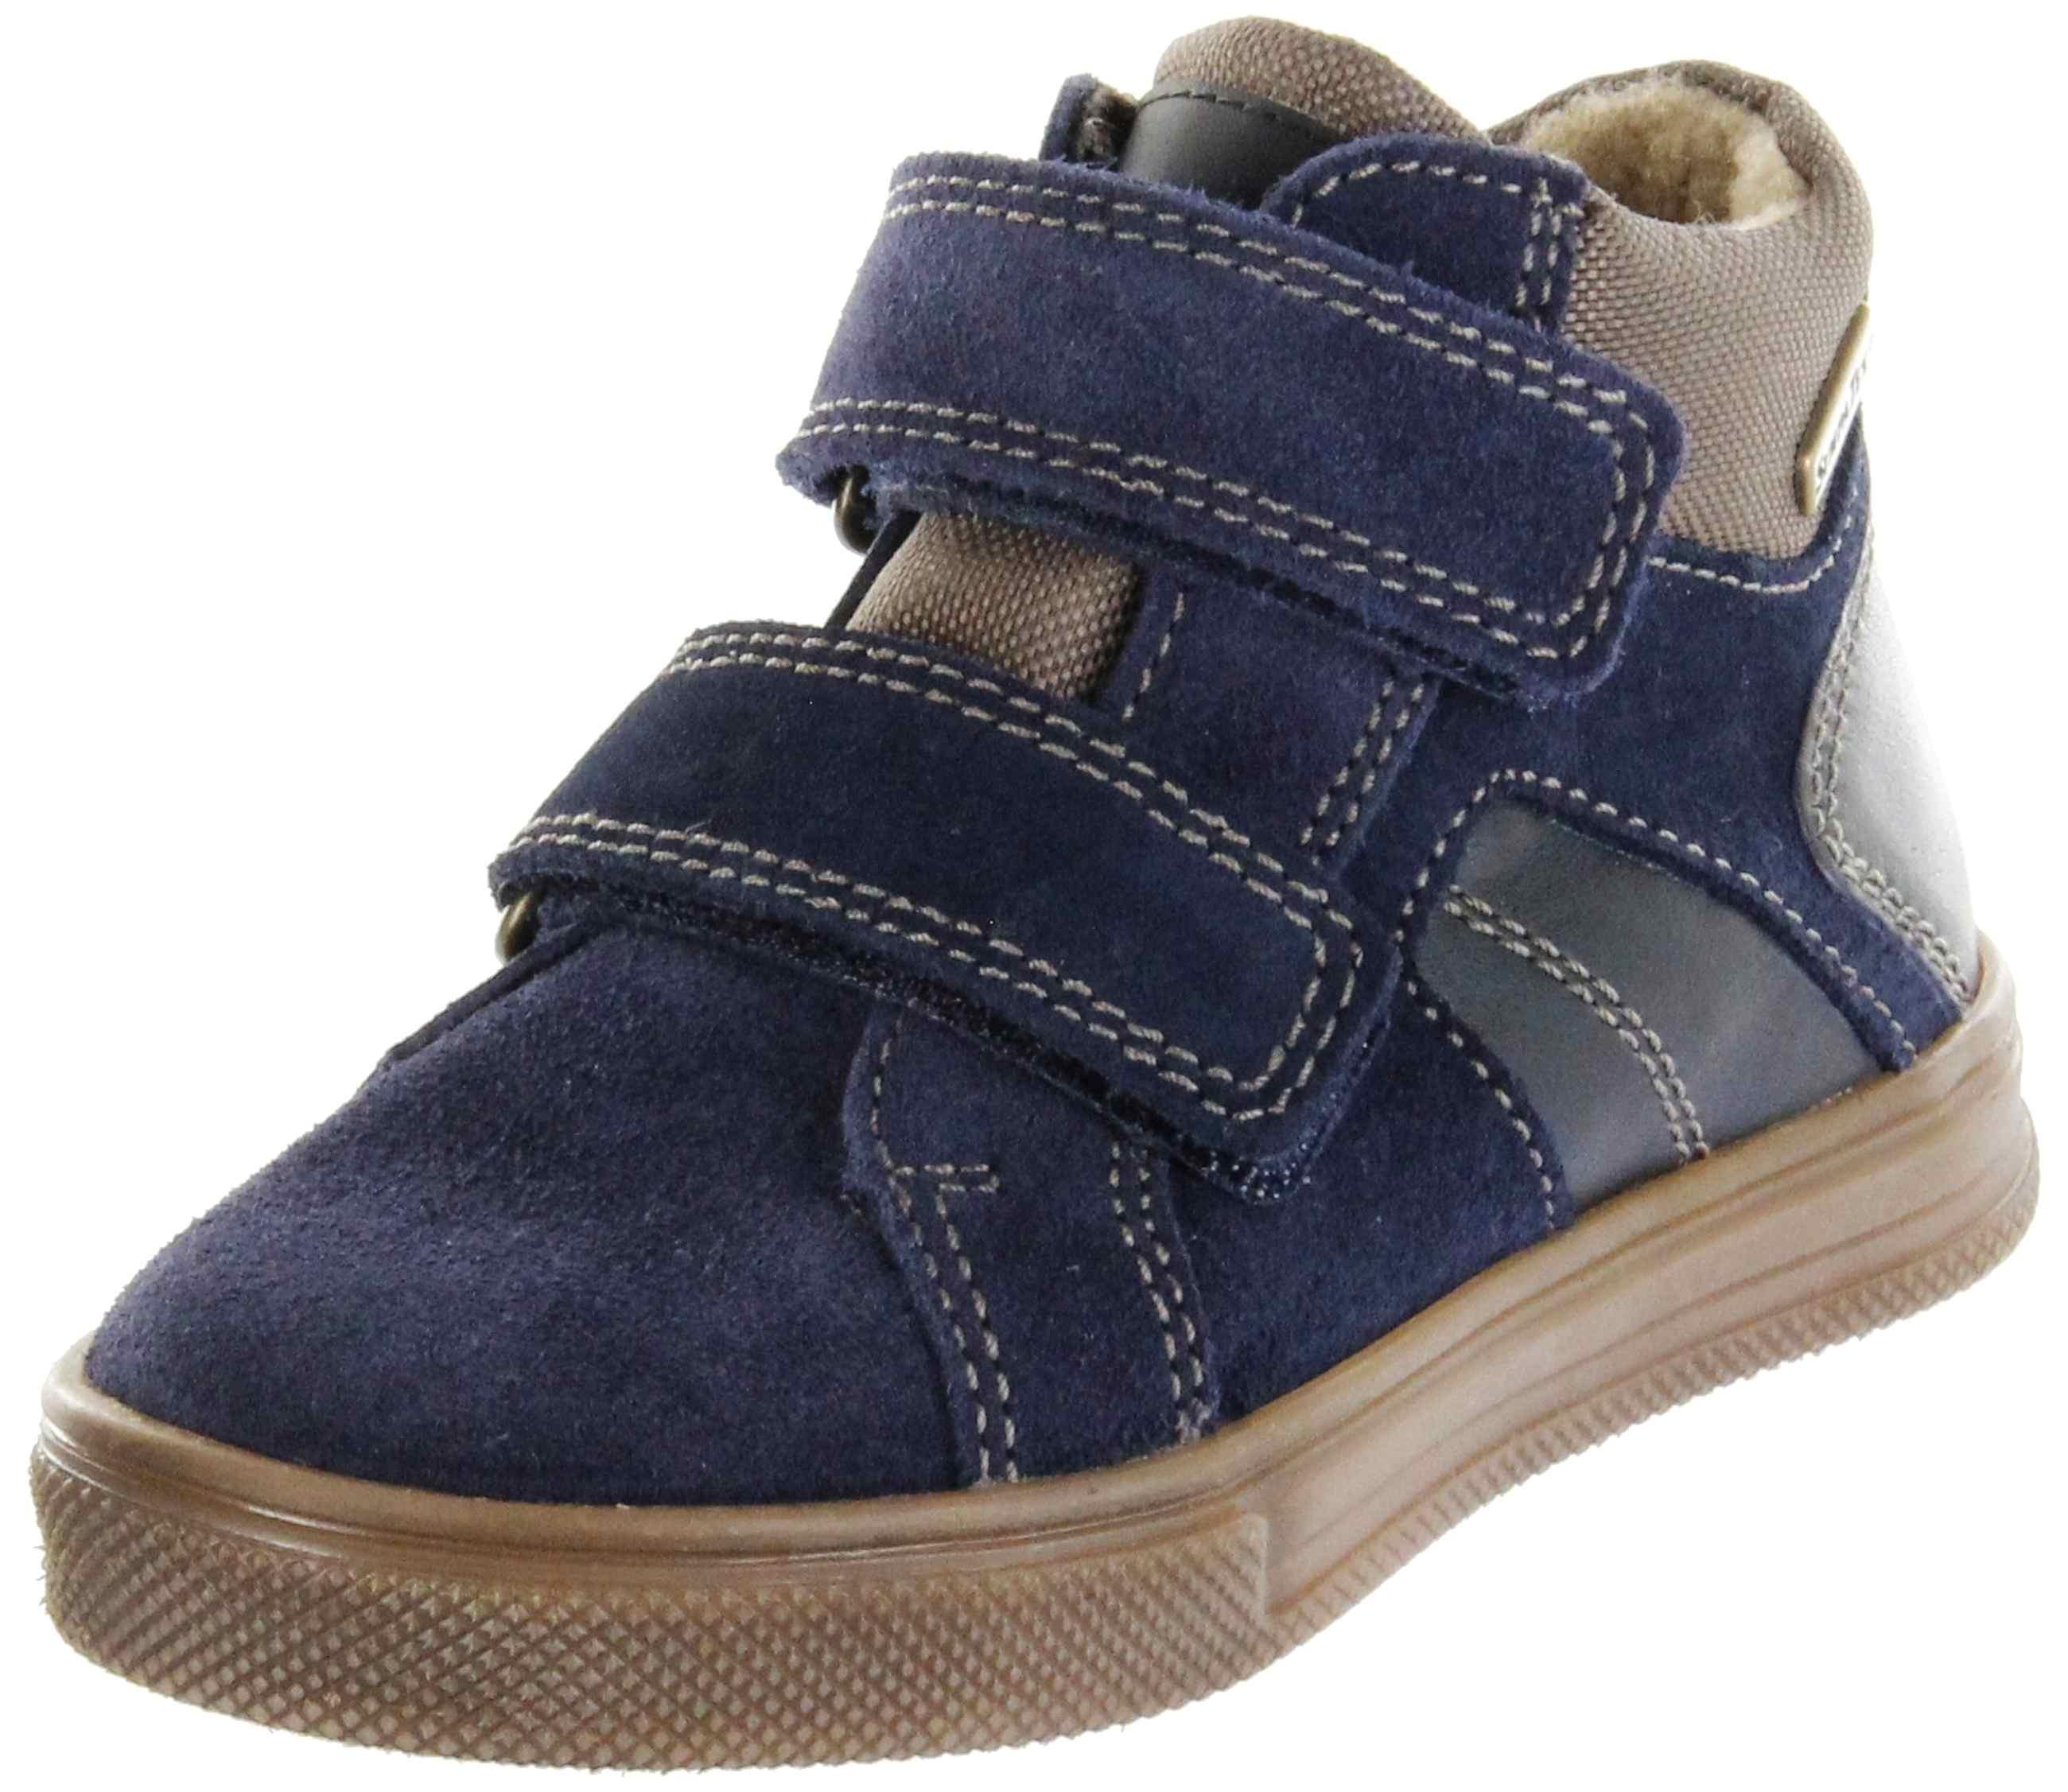 Richter Kinder Halbschuhe Sneaker blau Warm Leder Sympatex Jungen Schuhe 6539 441 7201 atlantic Ola